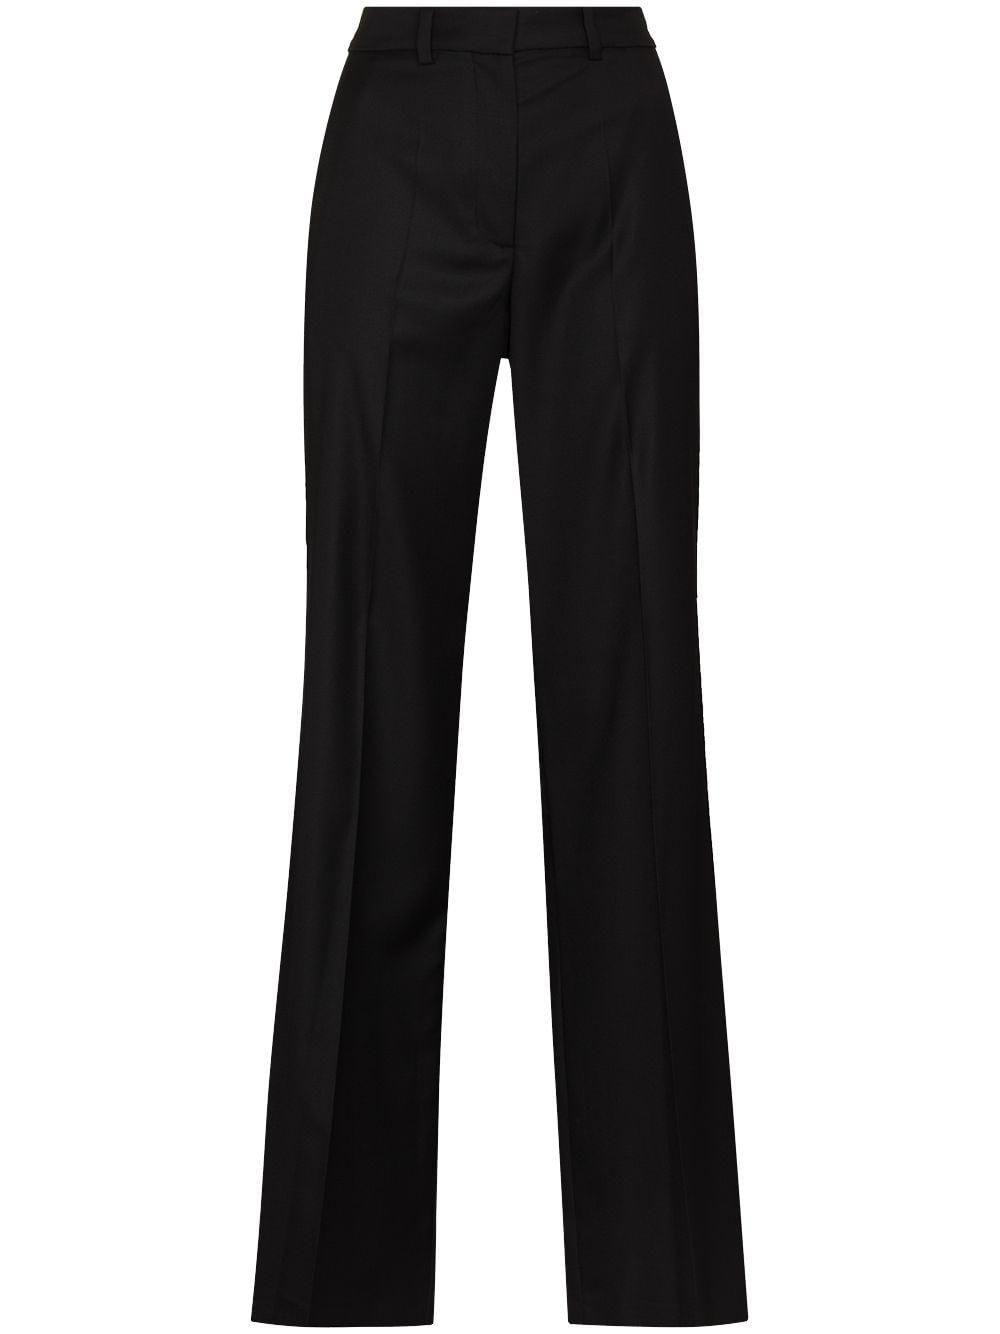 joseph morissey wool tailored trousers